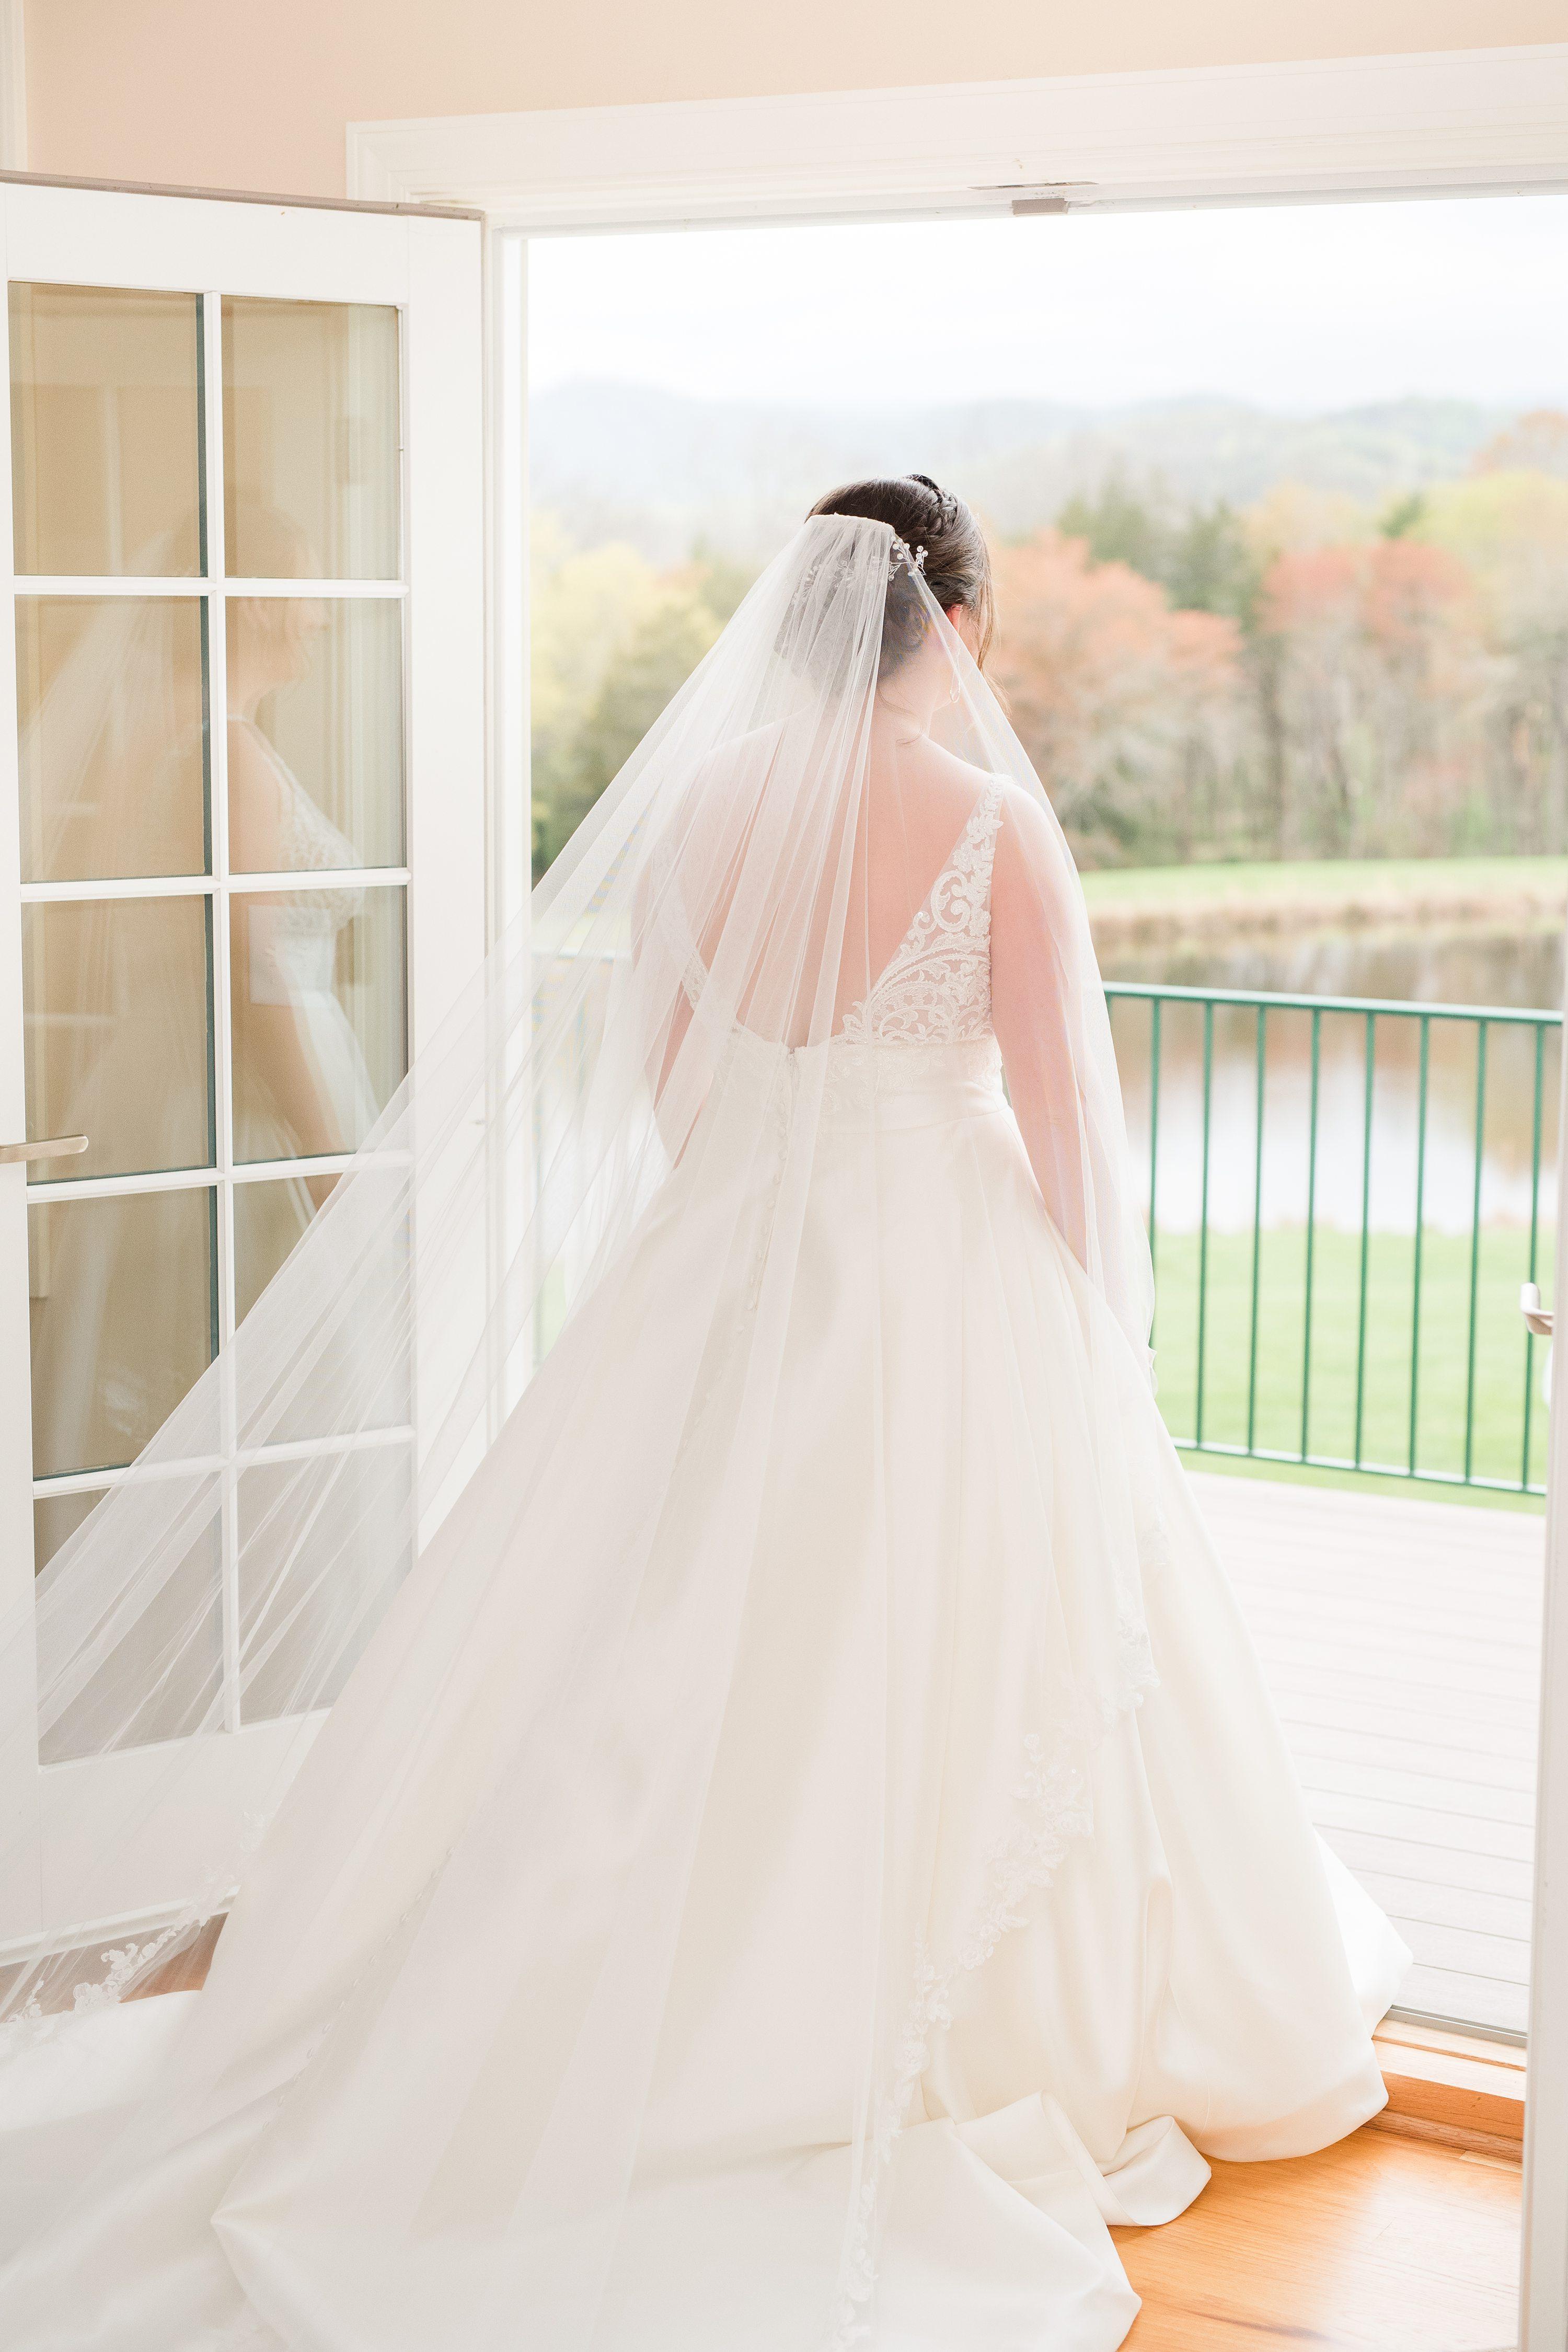 Charlottesville,Southern Wedding,Barn at Edgewood,edgewood barn,bride